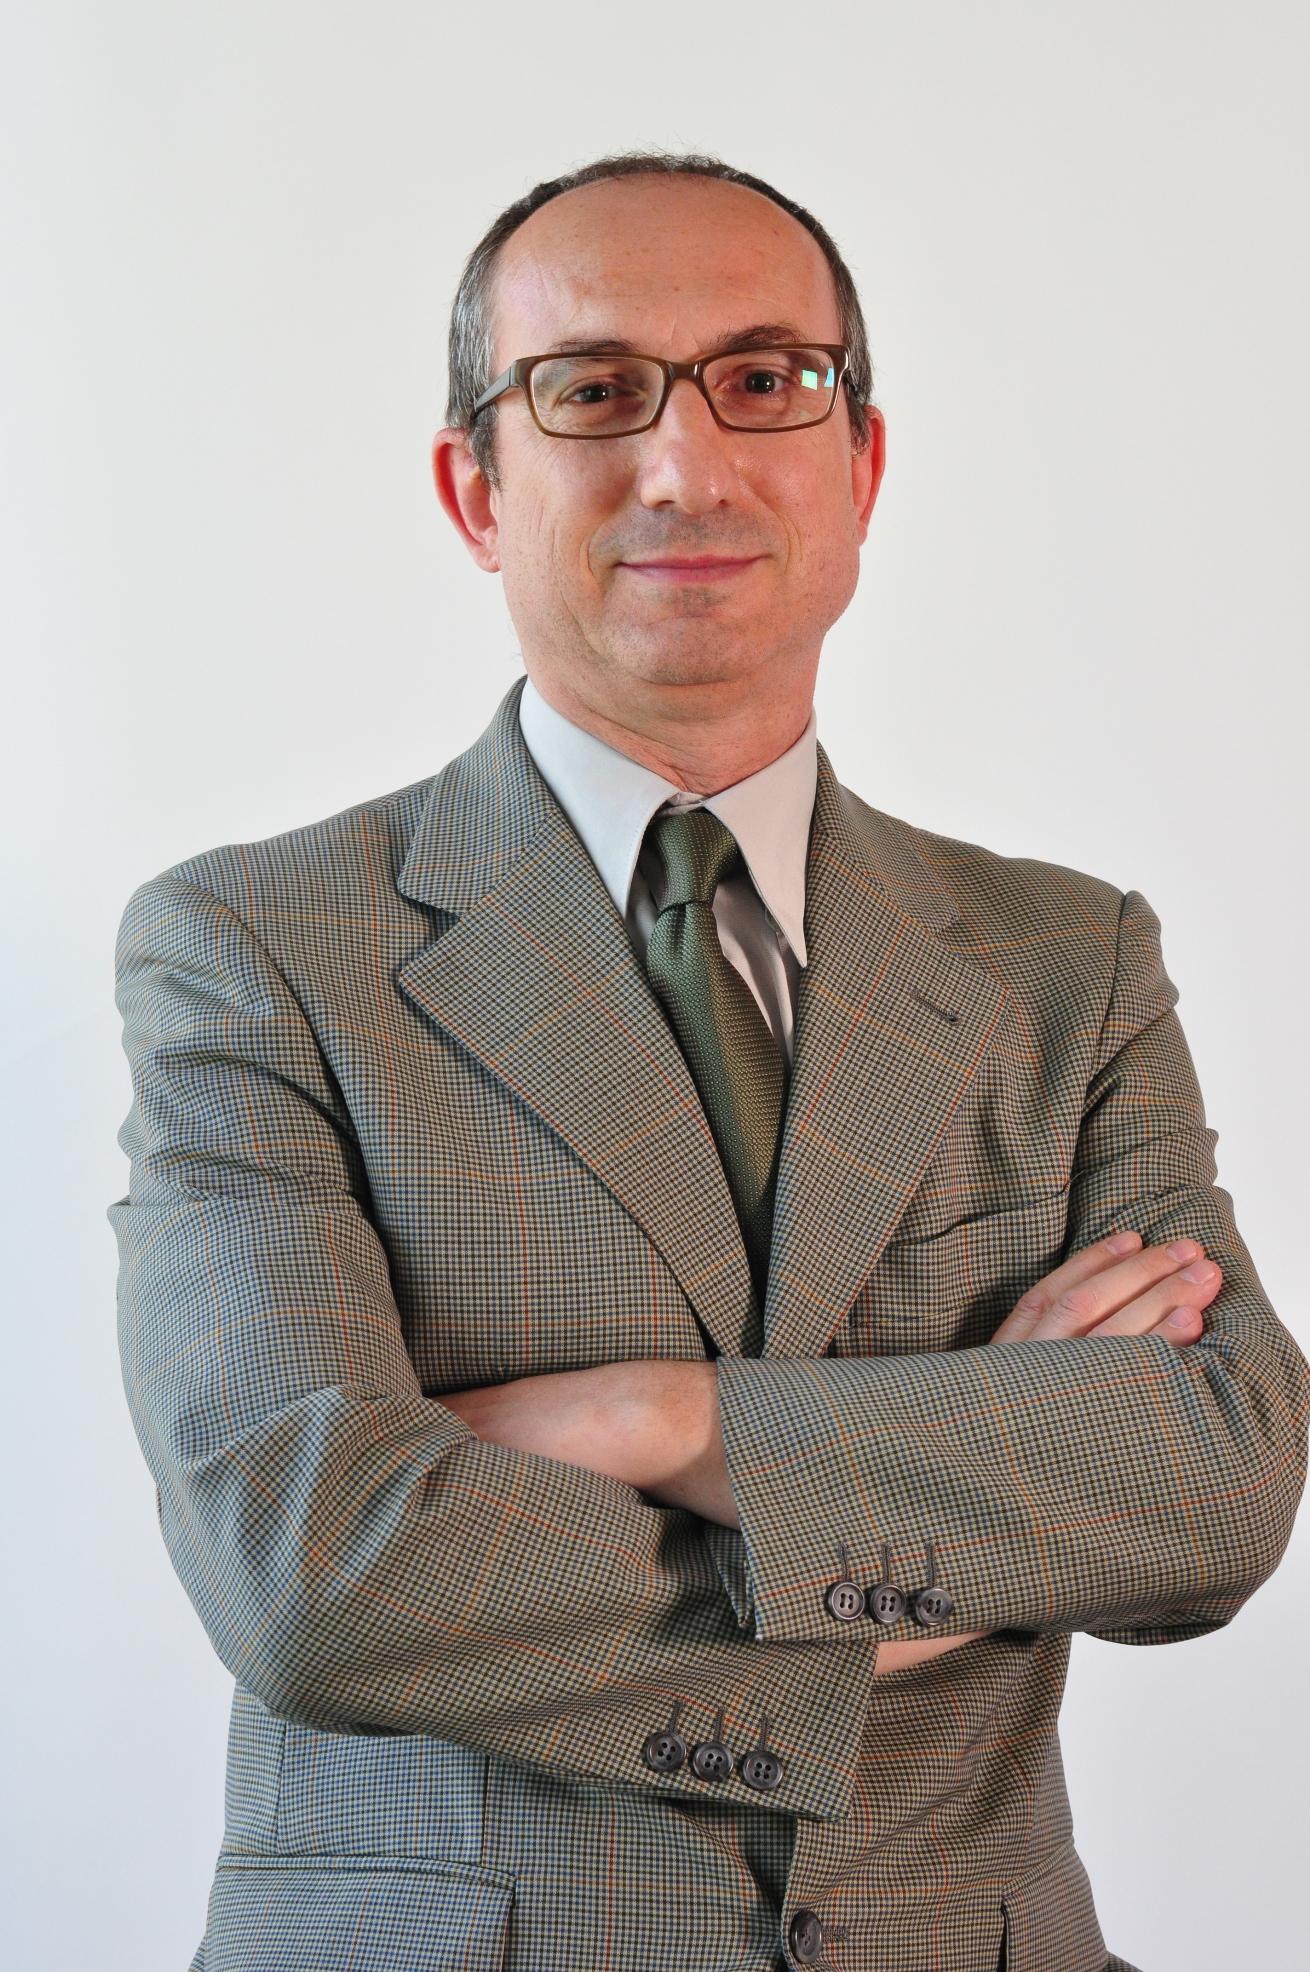 José María Doménech Folqué